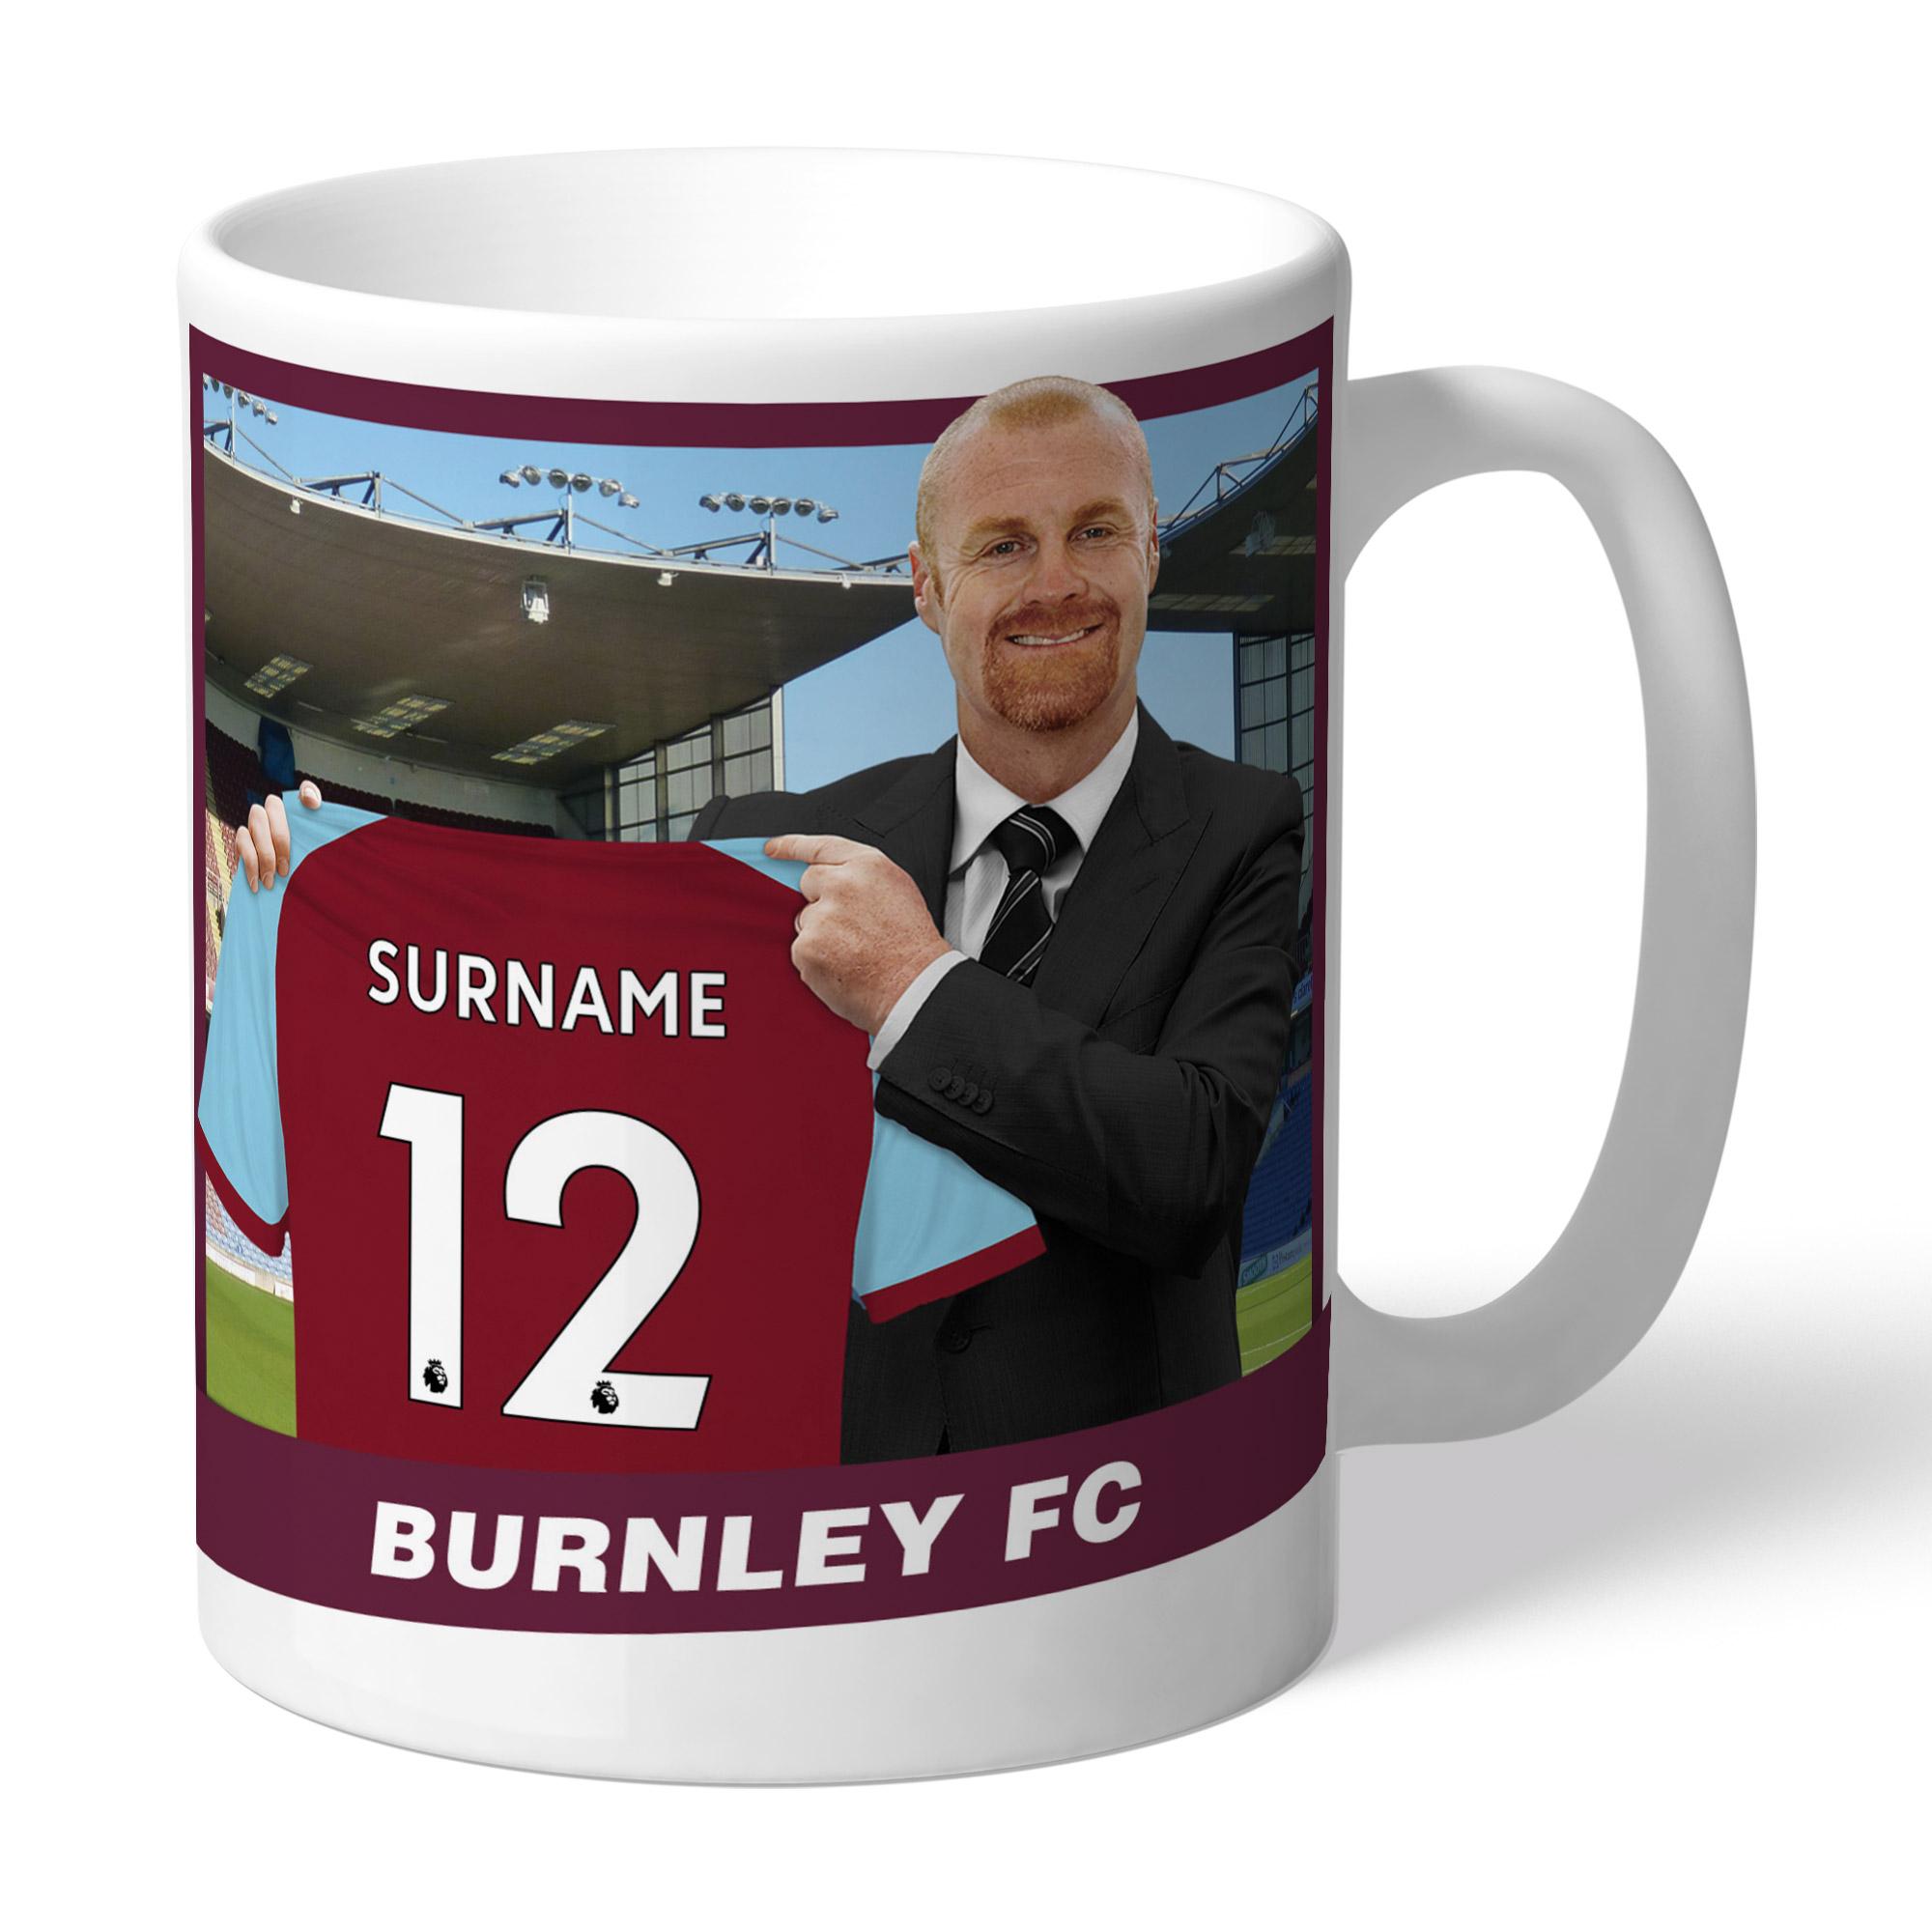 Burnley FC Manager Mug